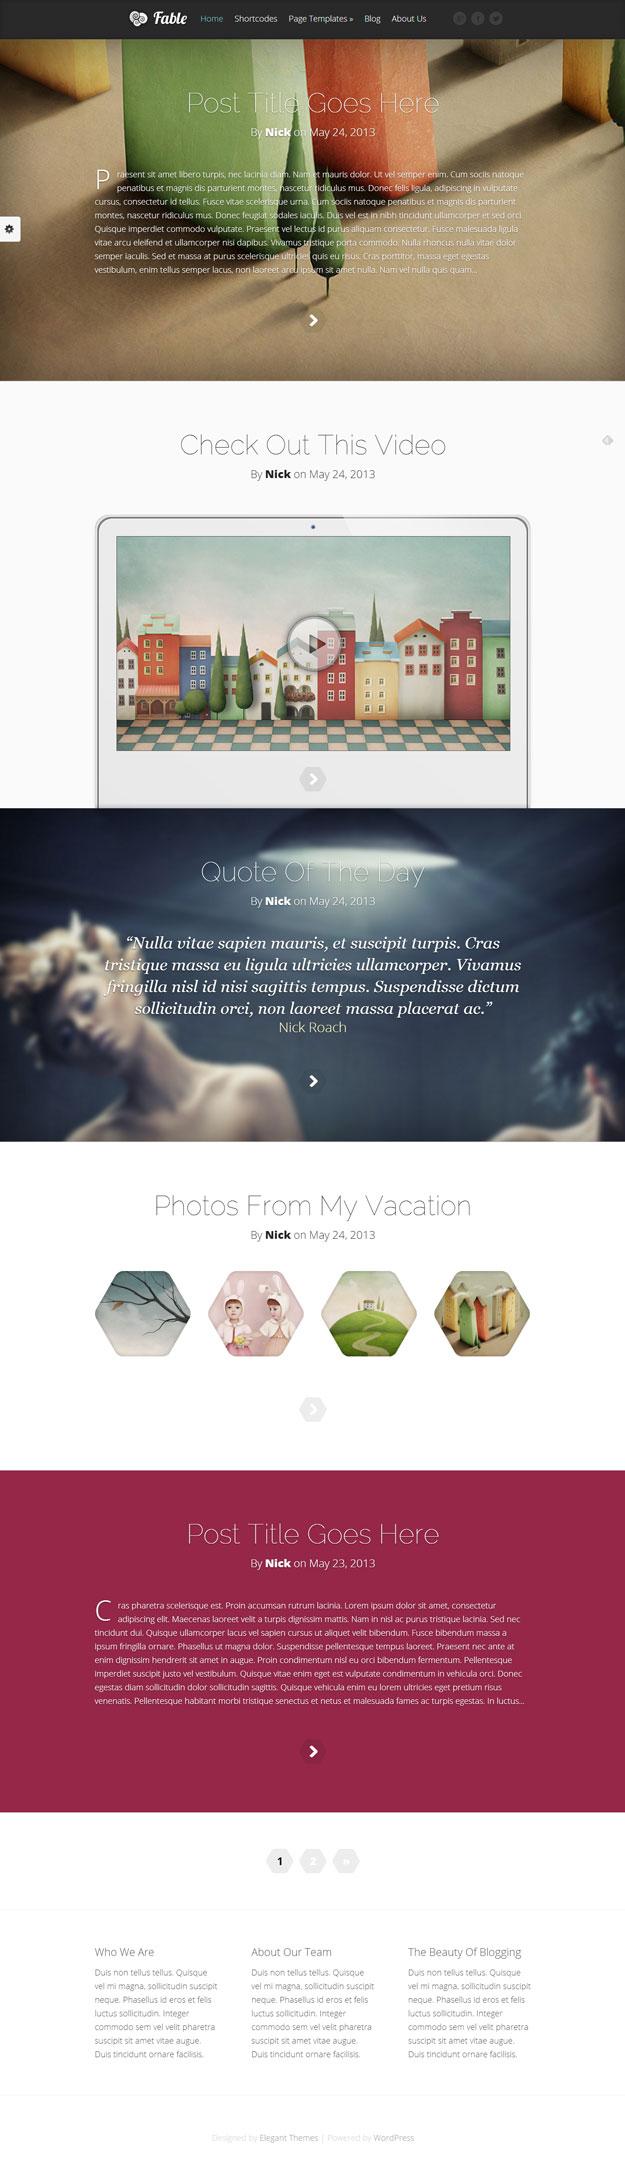 fable tumblr like wordpress theme